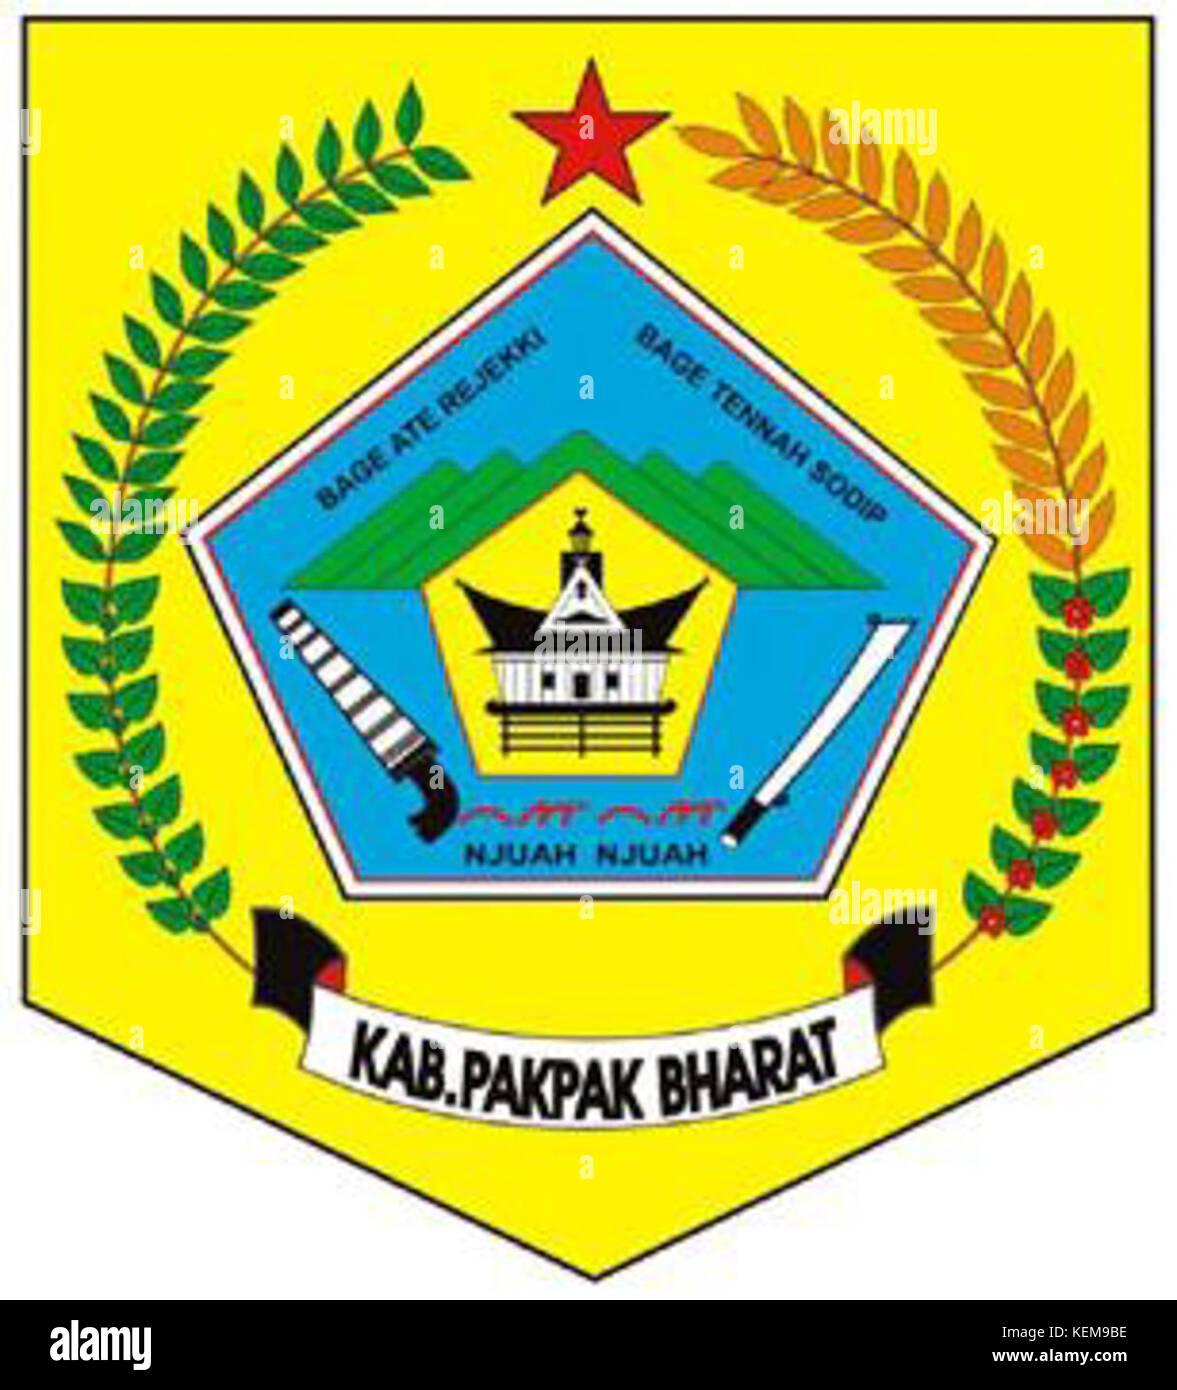 Lambang Kabupaten Pakpak Bharat Stock Photo Alamy